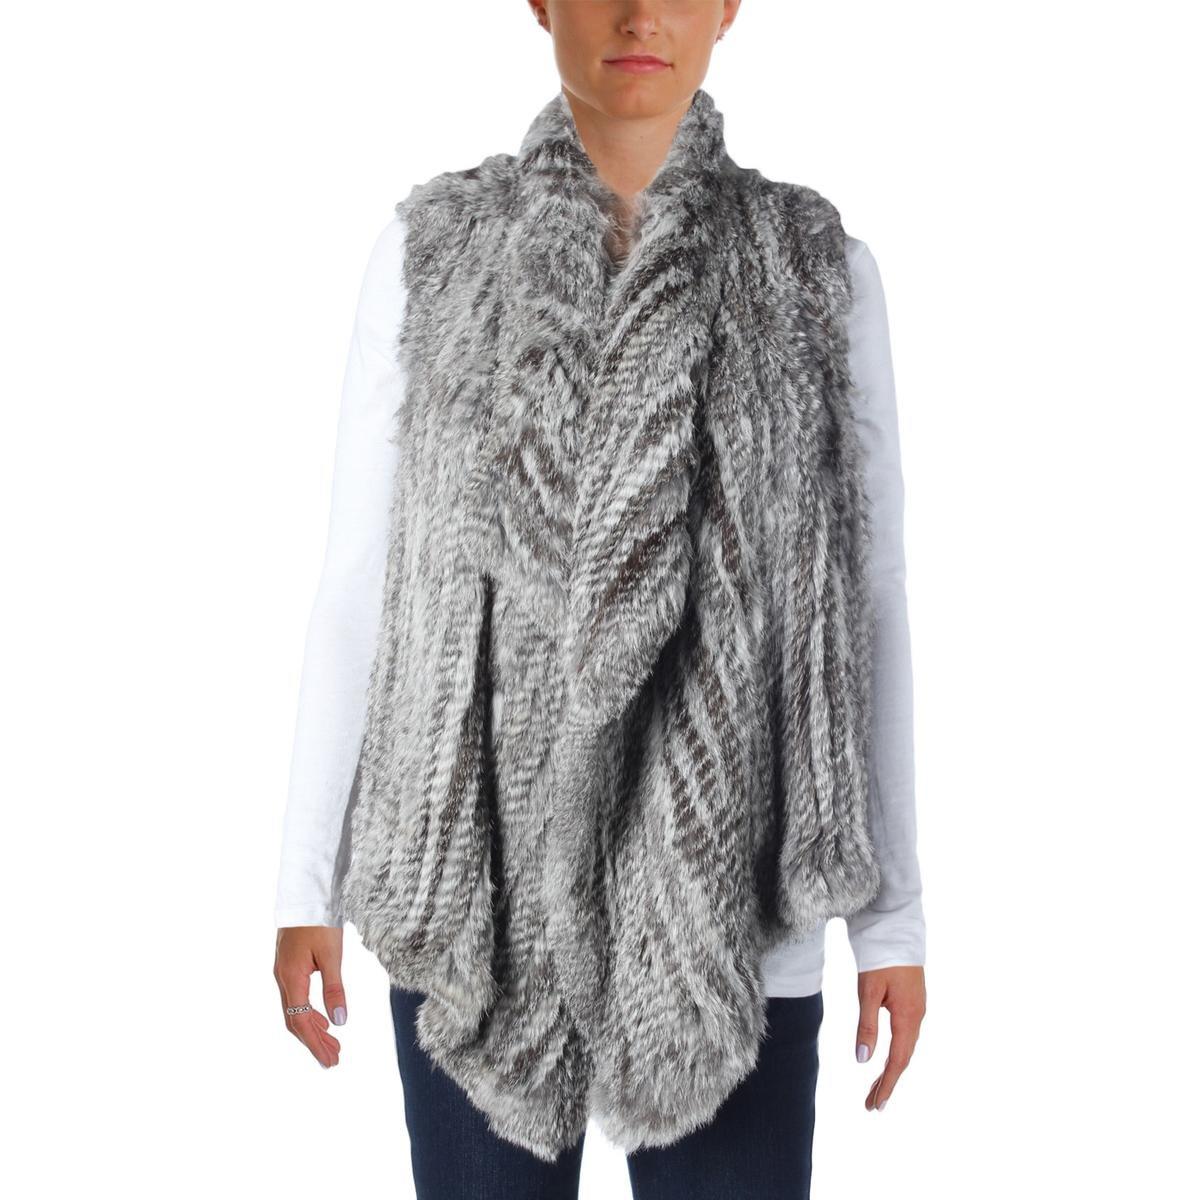 525 Made In America Womens Rabbit Fur Open Front Vest Gray S